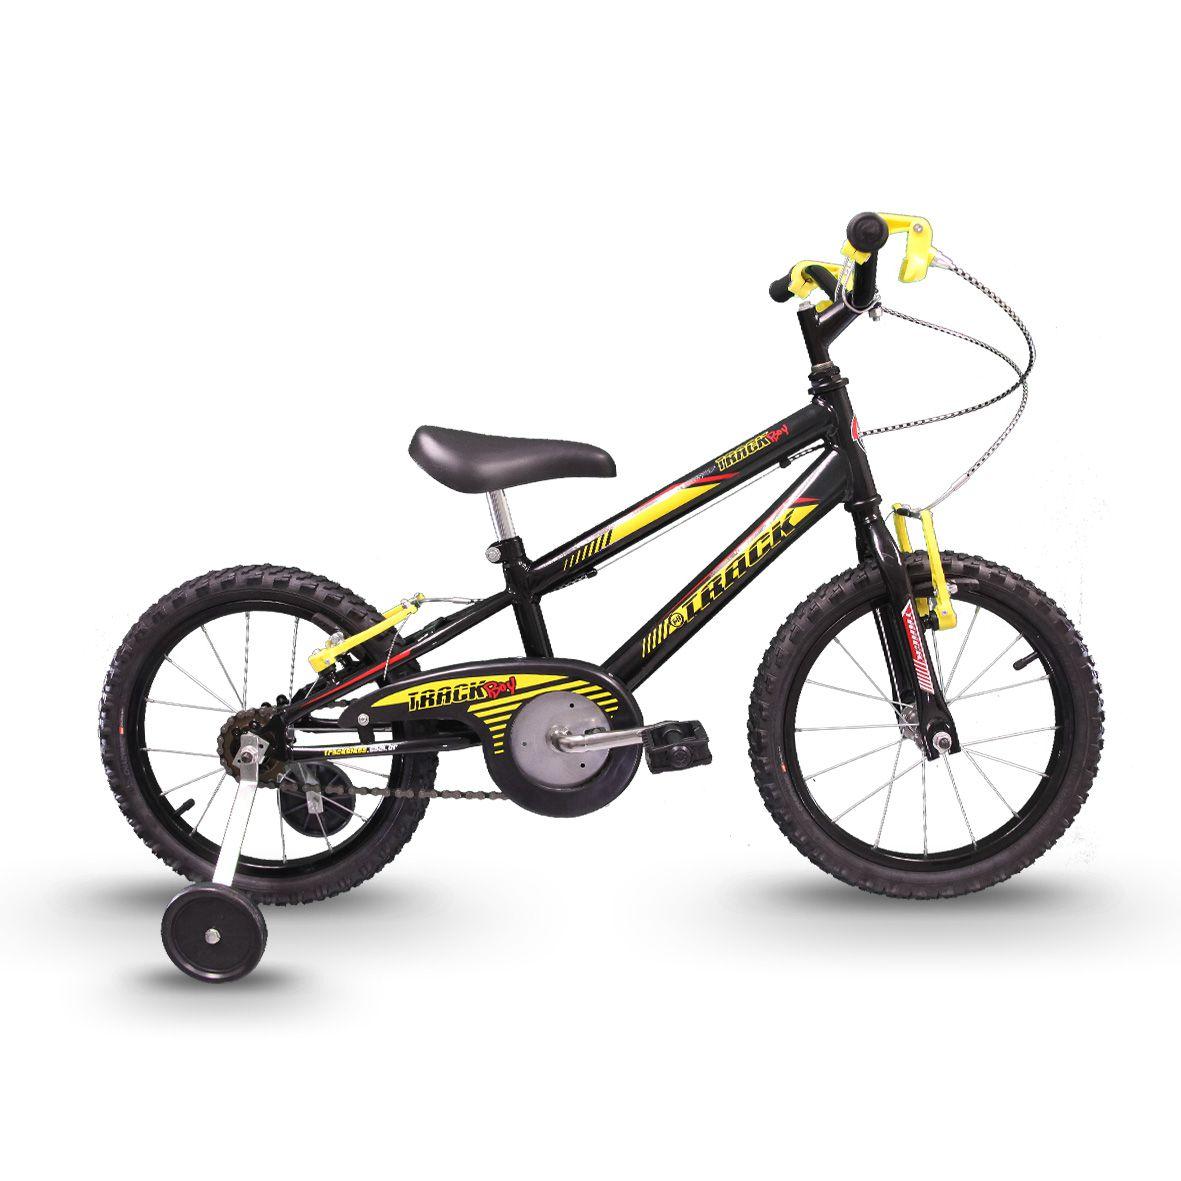 Bicicleta Track Bikes Track Boy Infantil Aro 16 Seminova